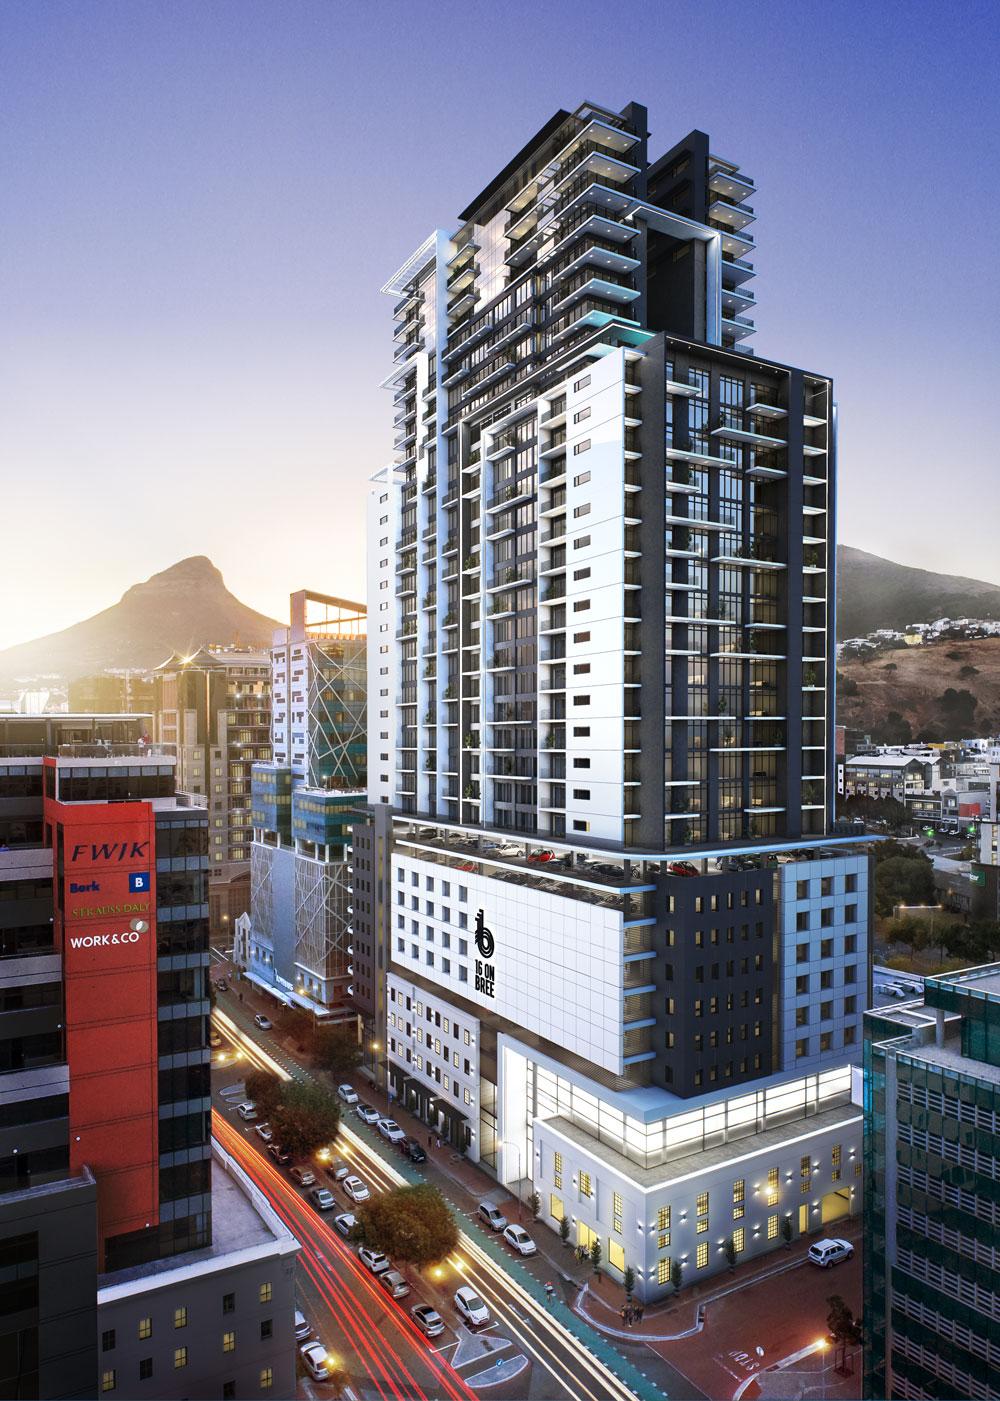 16 on Bree | Cape Town property development | FWJK